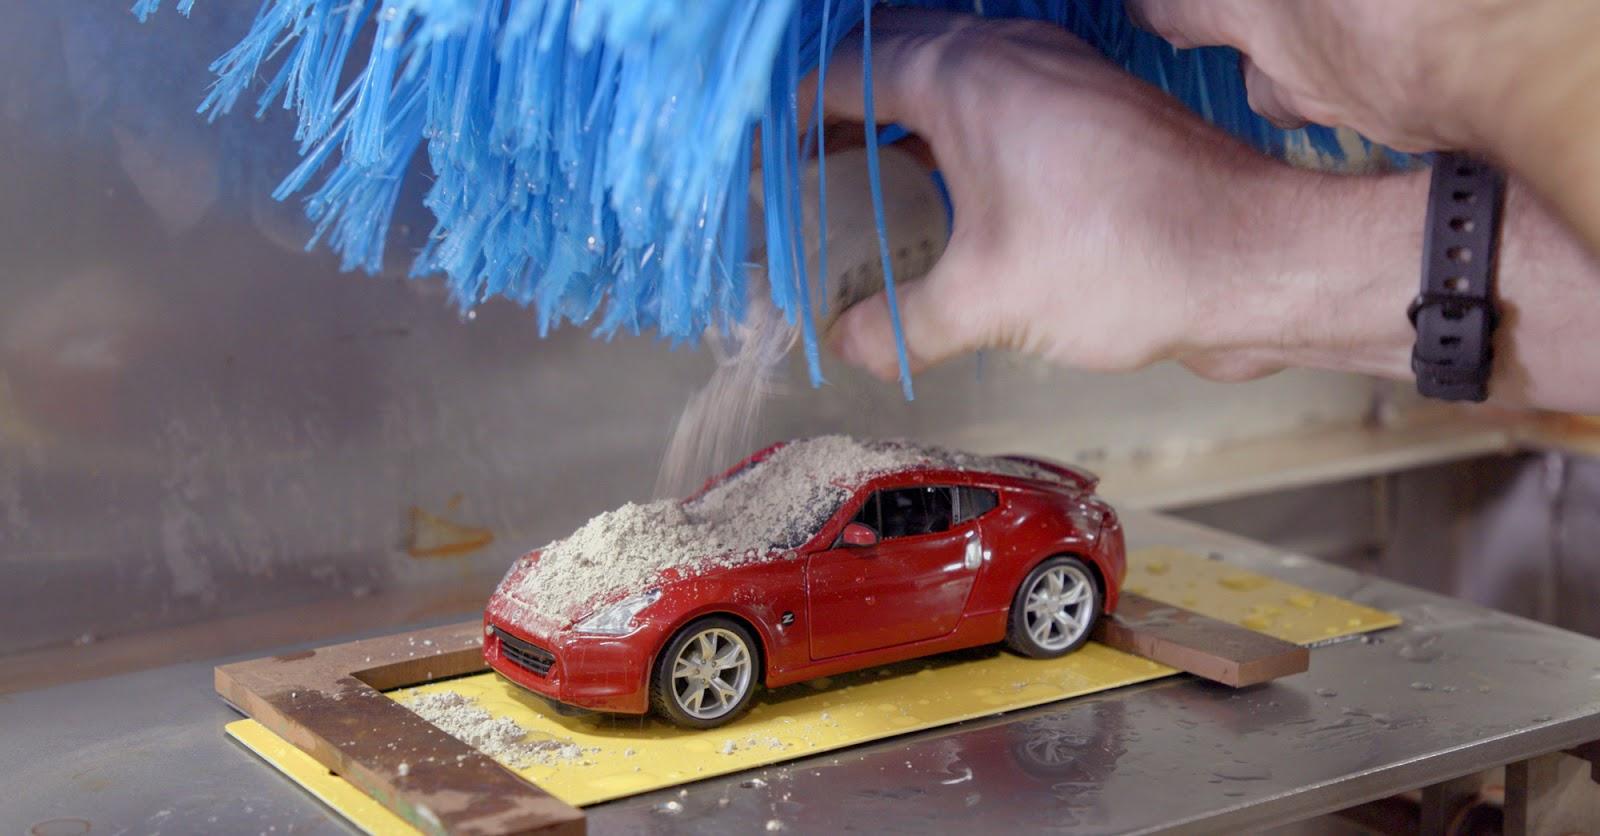 Nissan Car Wash Photo 1 Πώς δοκιμάζει την αντοχή των χρωμάτων της η Nissan Nissan, Nissan 370Z, video, videos, βίντεο, Τεχνολογία